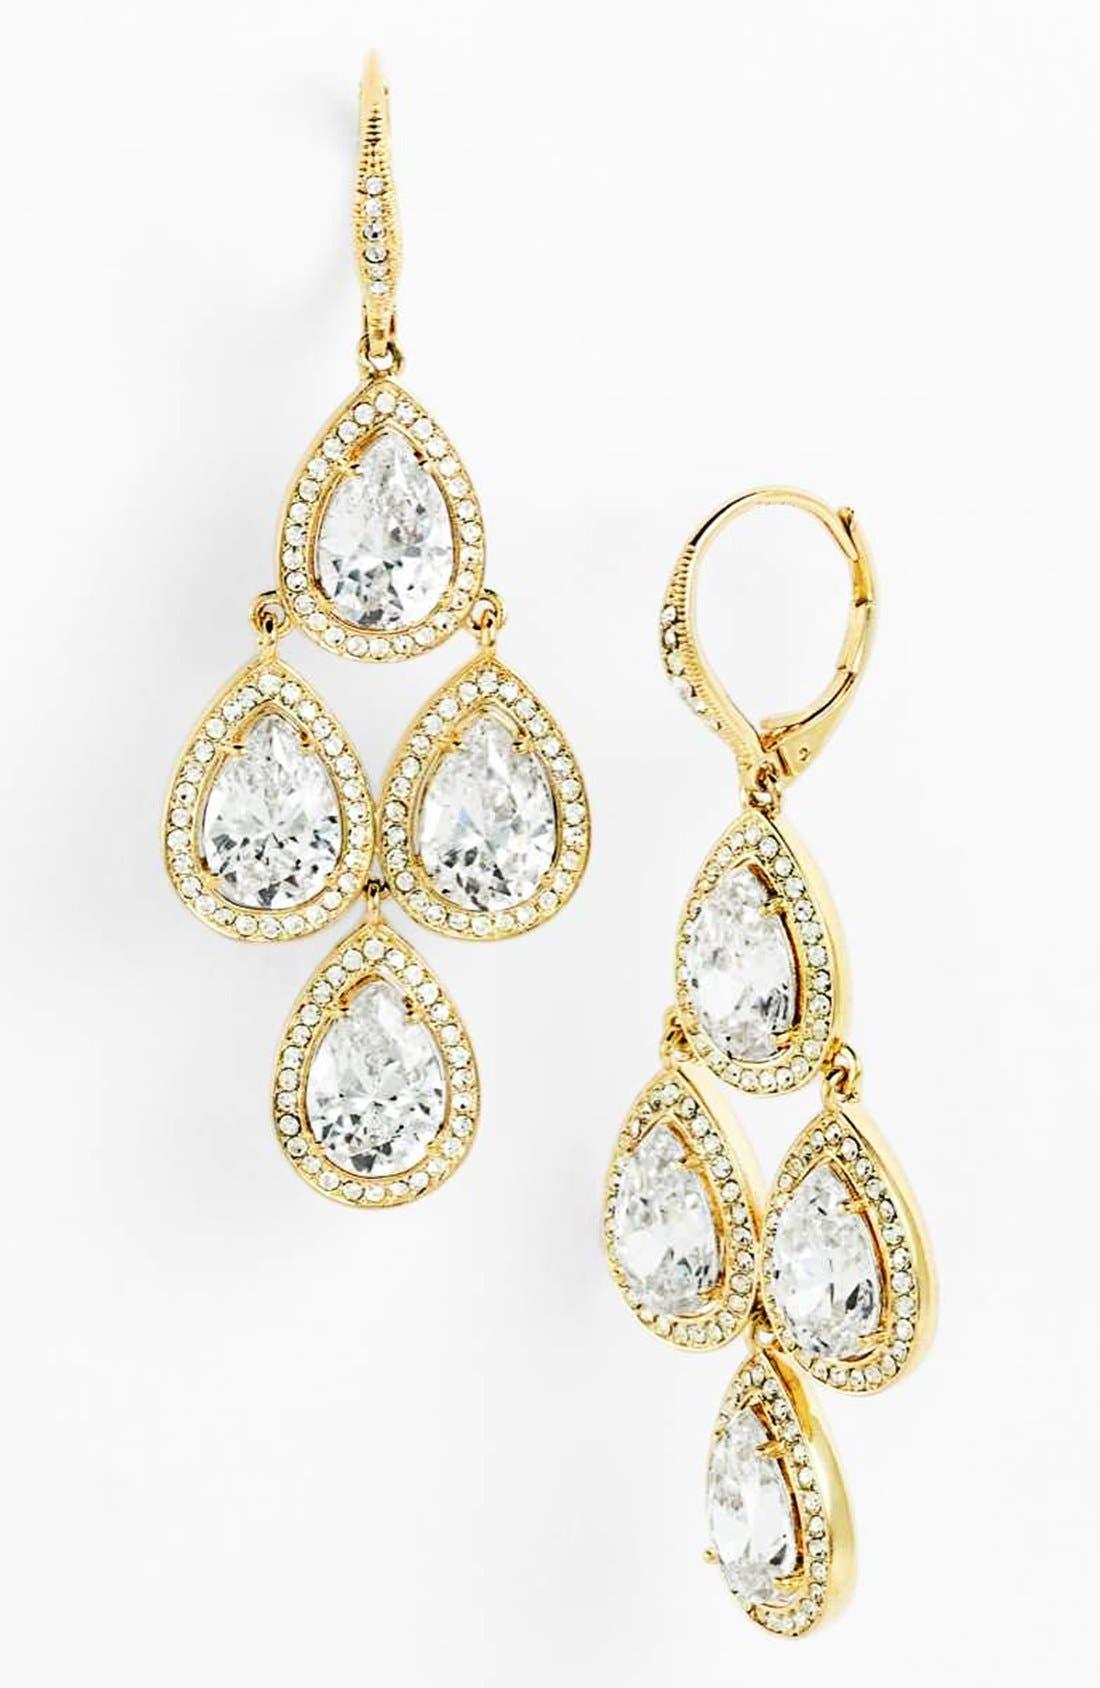 Alternate Image 1 Selected - Nadri Cubic Zirconia Chandelier Earrings (Nordstrom Exclusive)